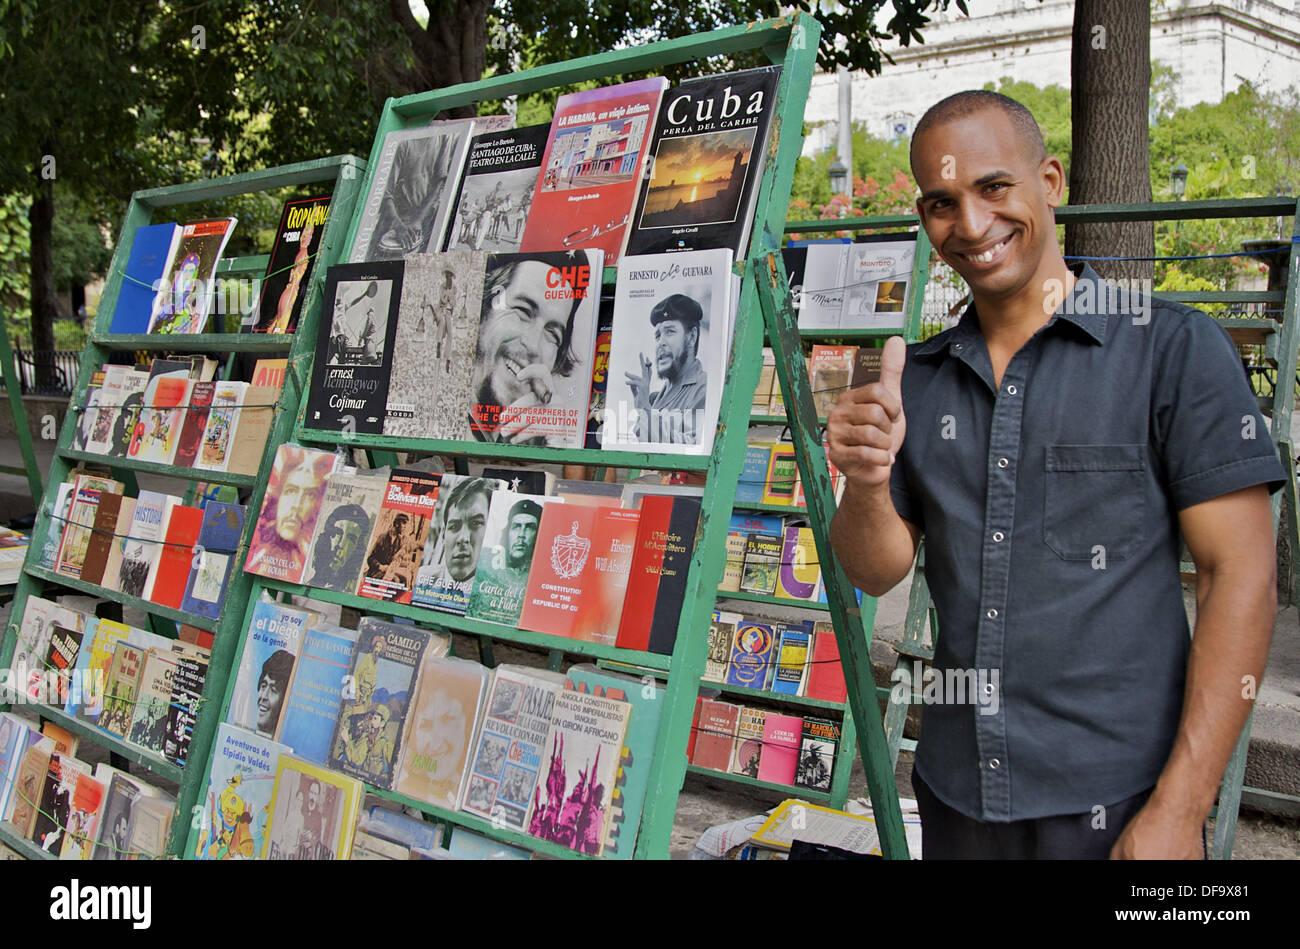 A book seller at his book racks in the Plaza De Armas. - Stock Image